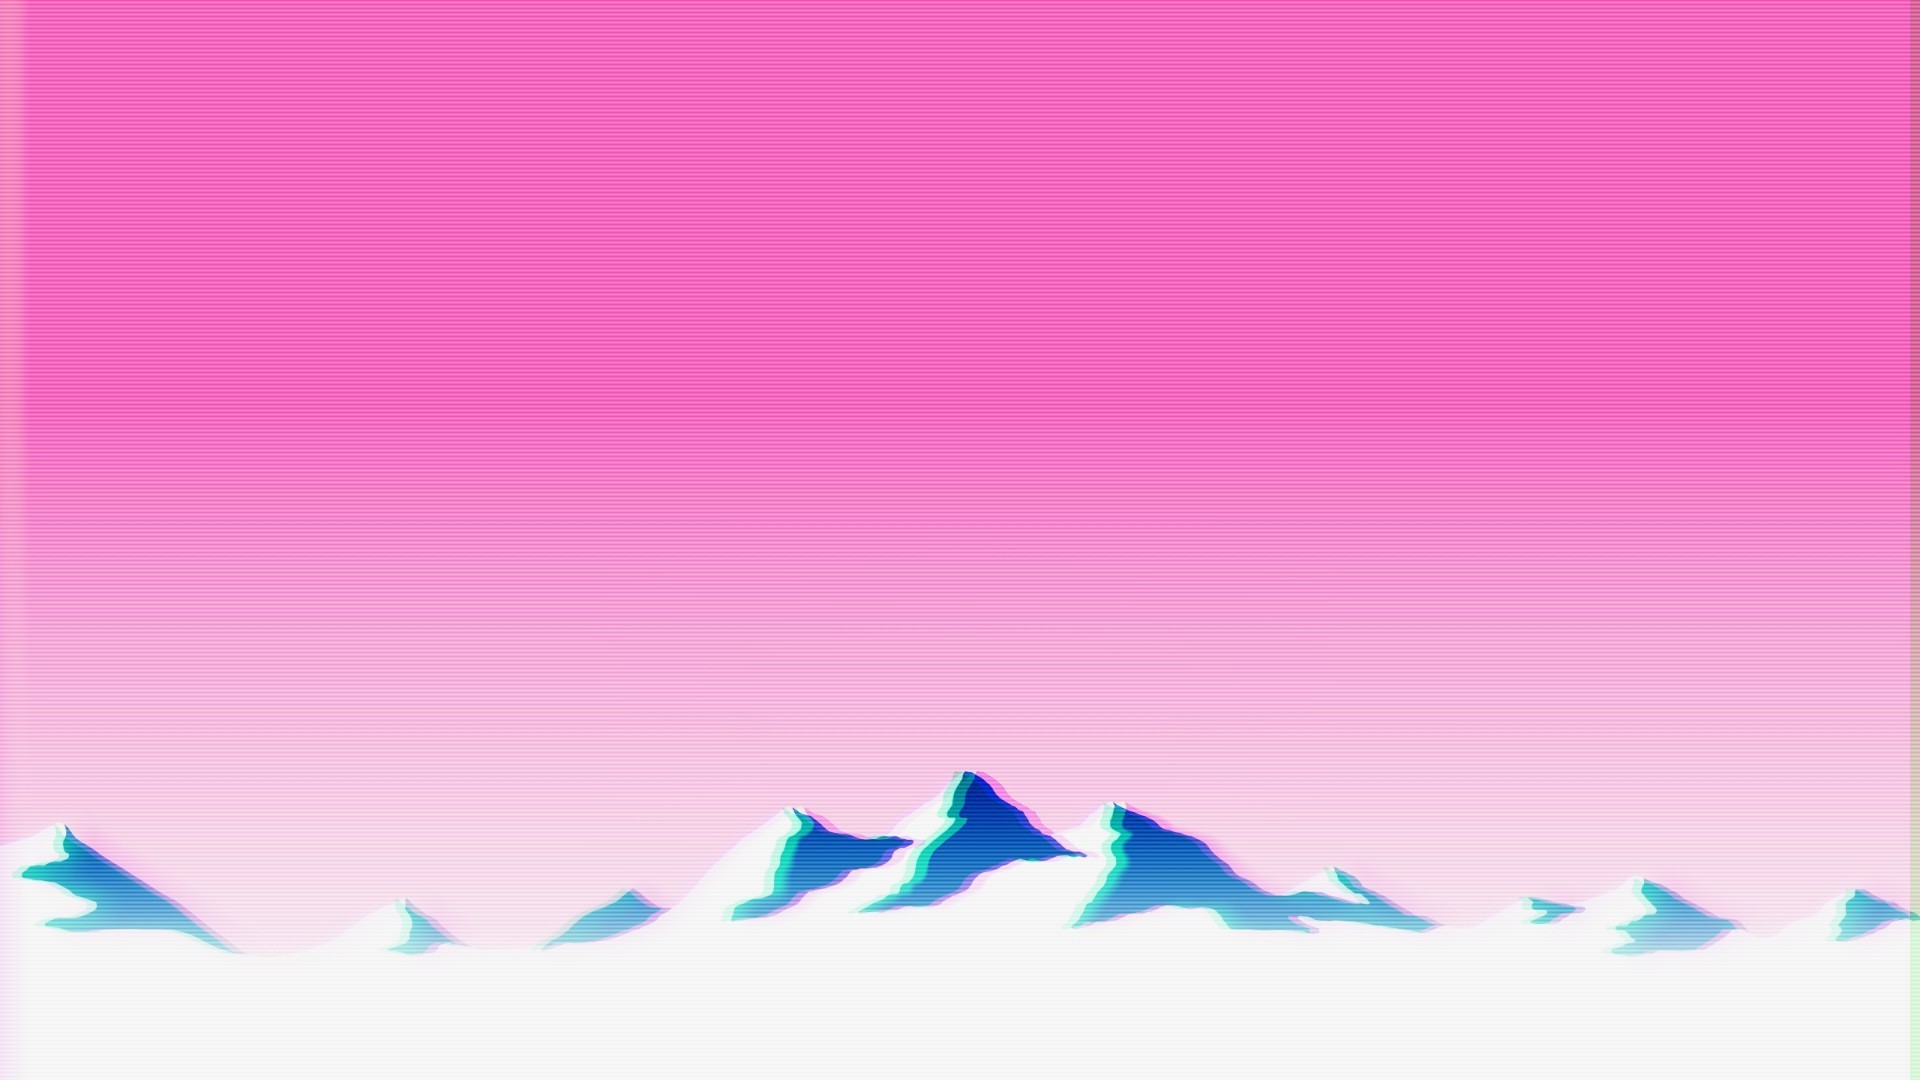 Hotline Miami Iphone Wallpaper Vaporwave Iphone Wallpaper 183 ① Download Free Stunning High